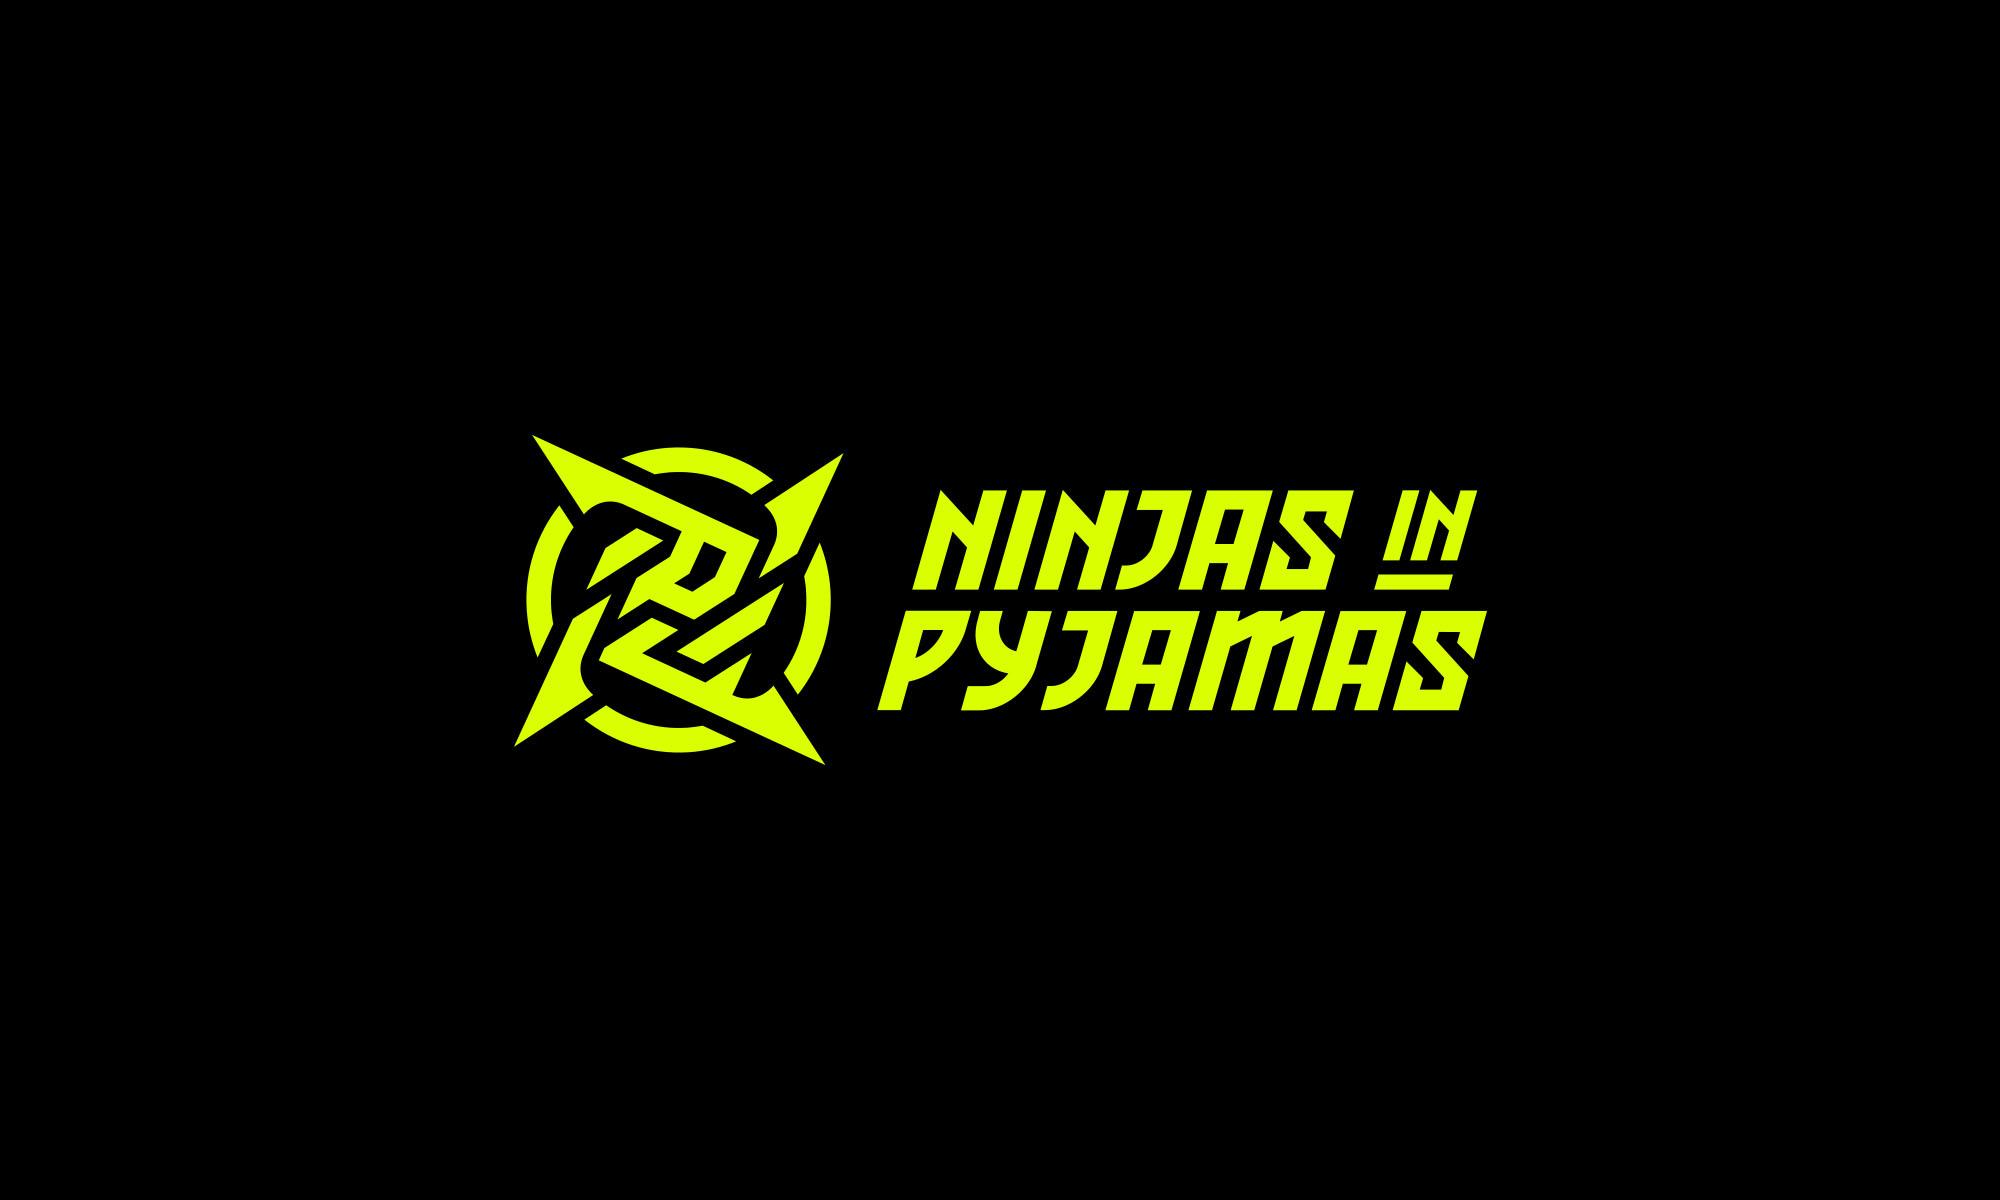 ninjas in pyjamas rebranding